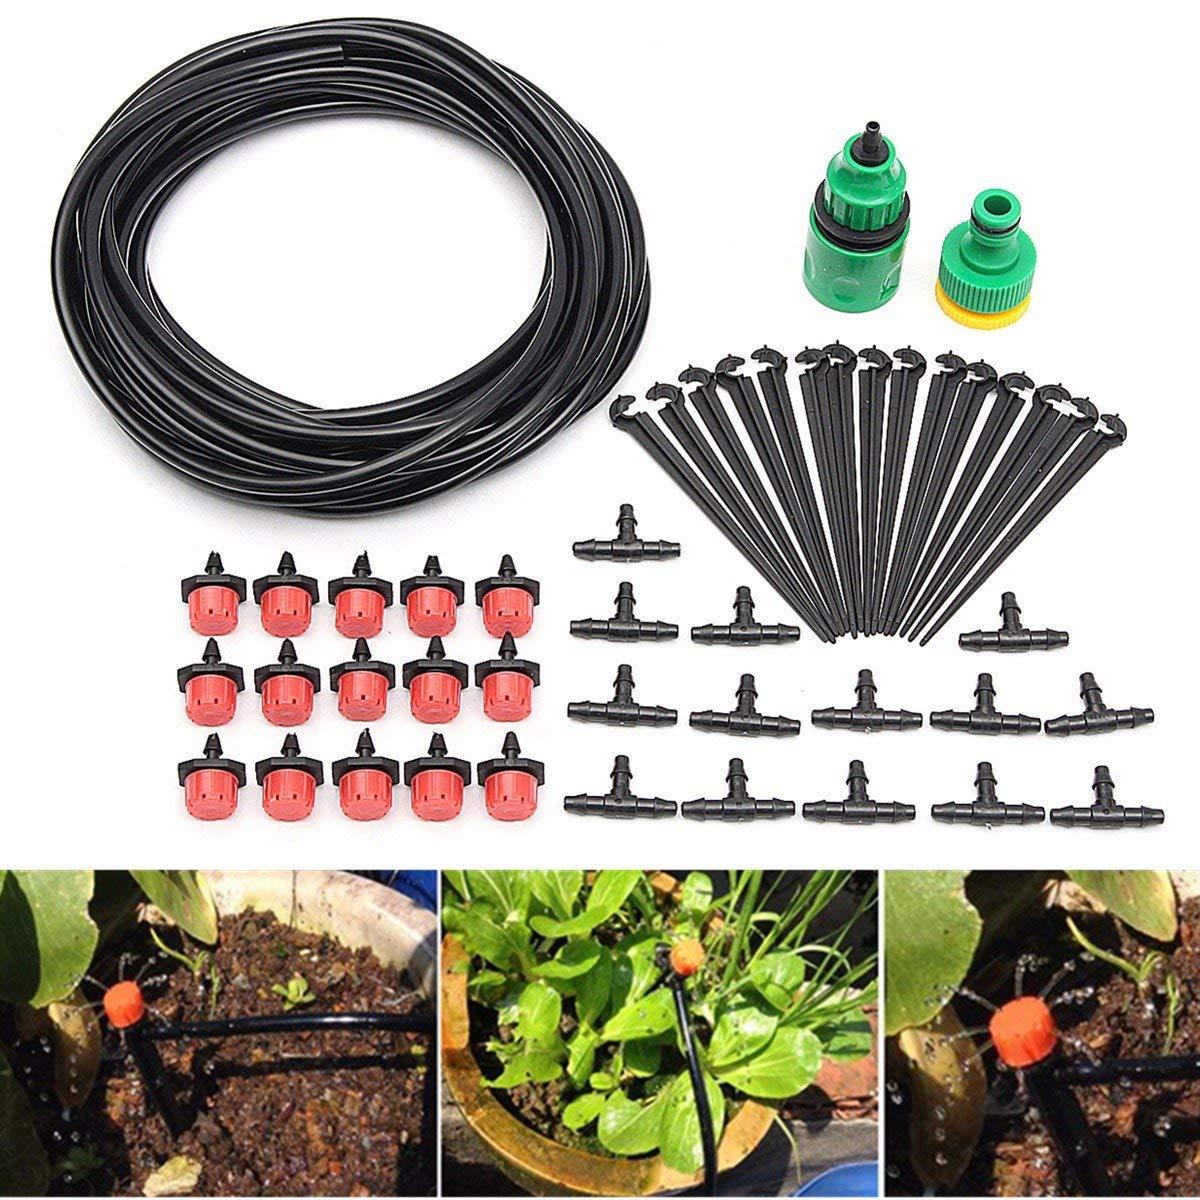 Micro-Flow Drip Watering Irrigation Kits System Self Plant Garden Hose Watering Kits 10 Metre Hose